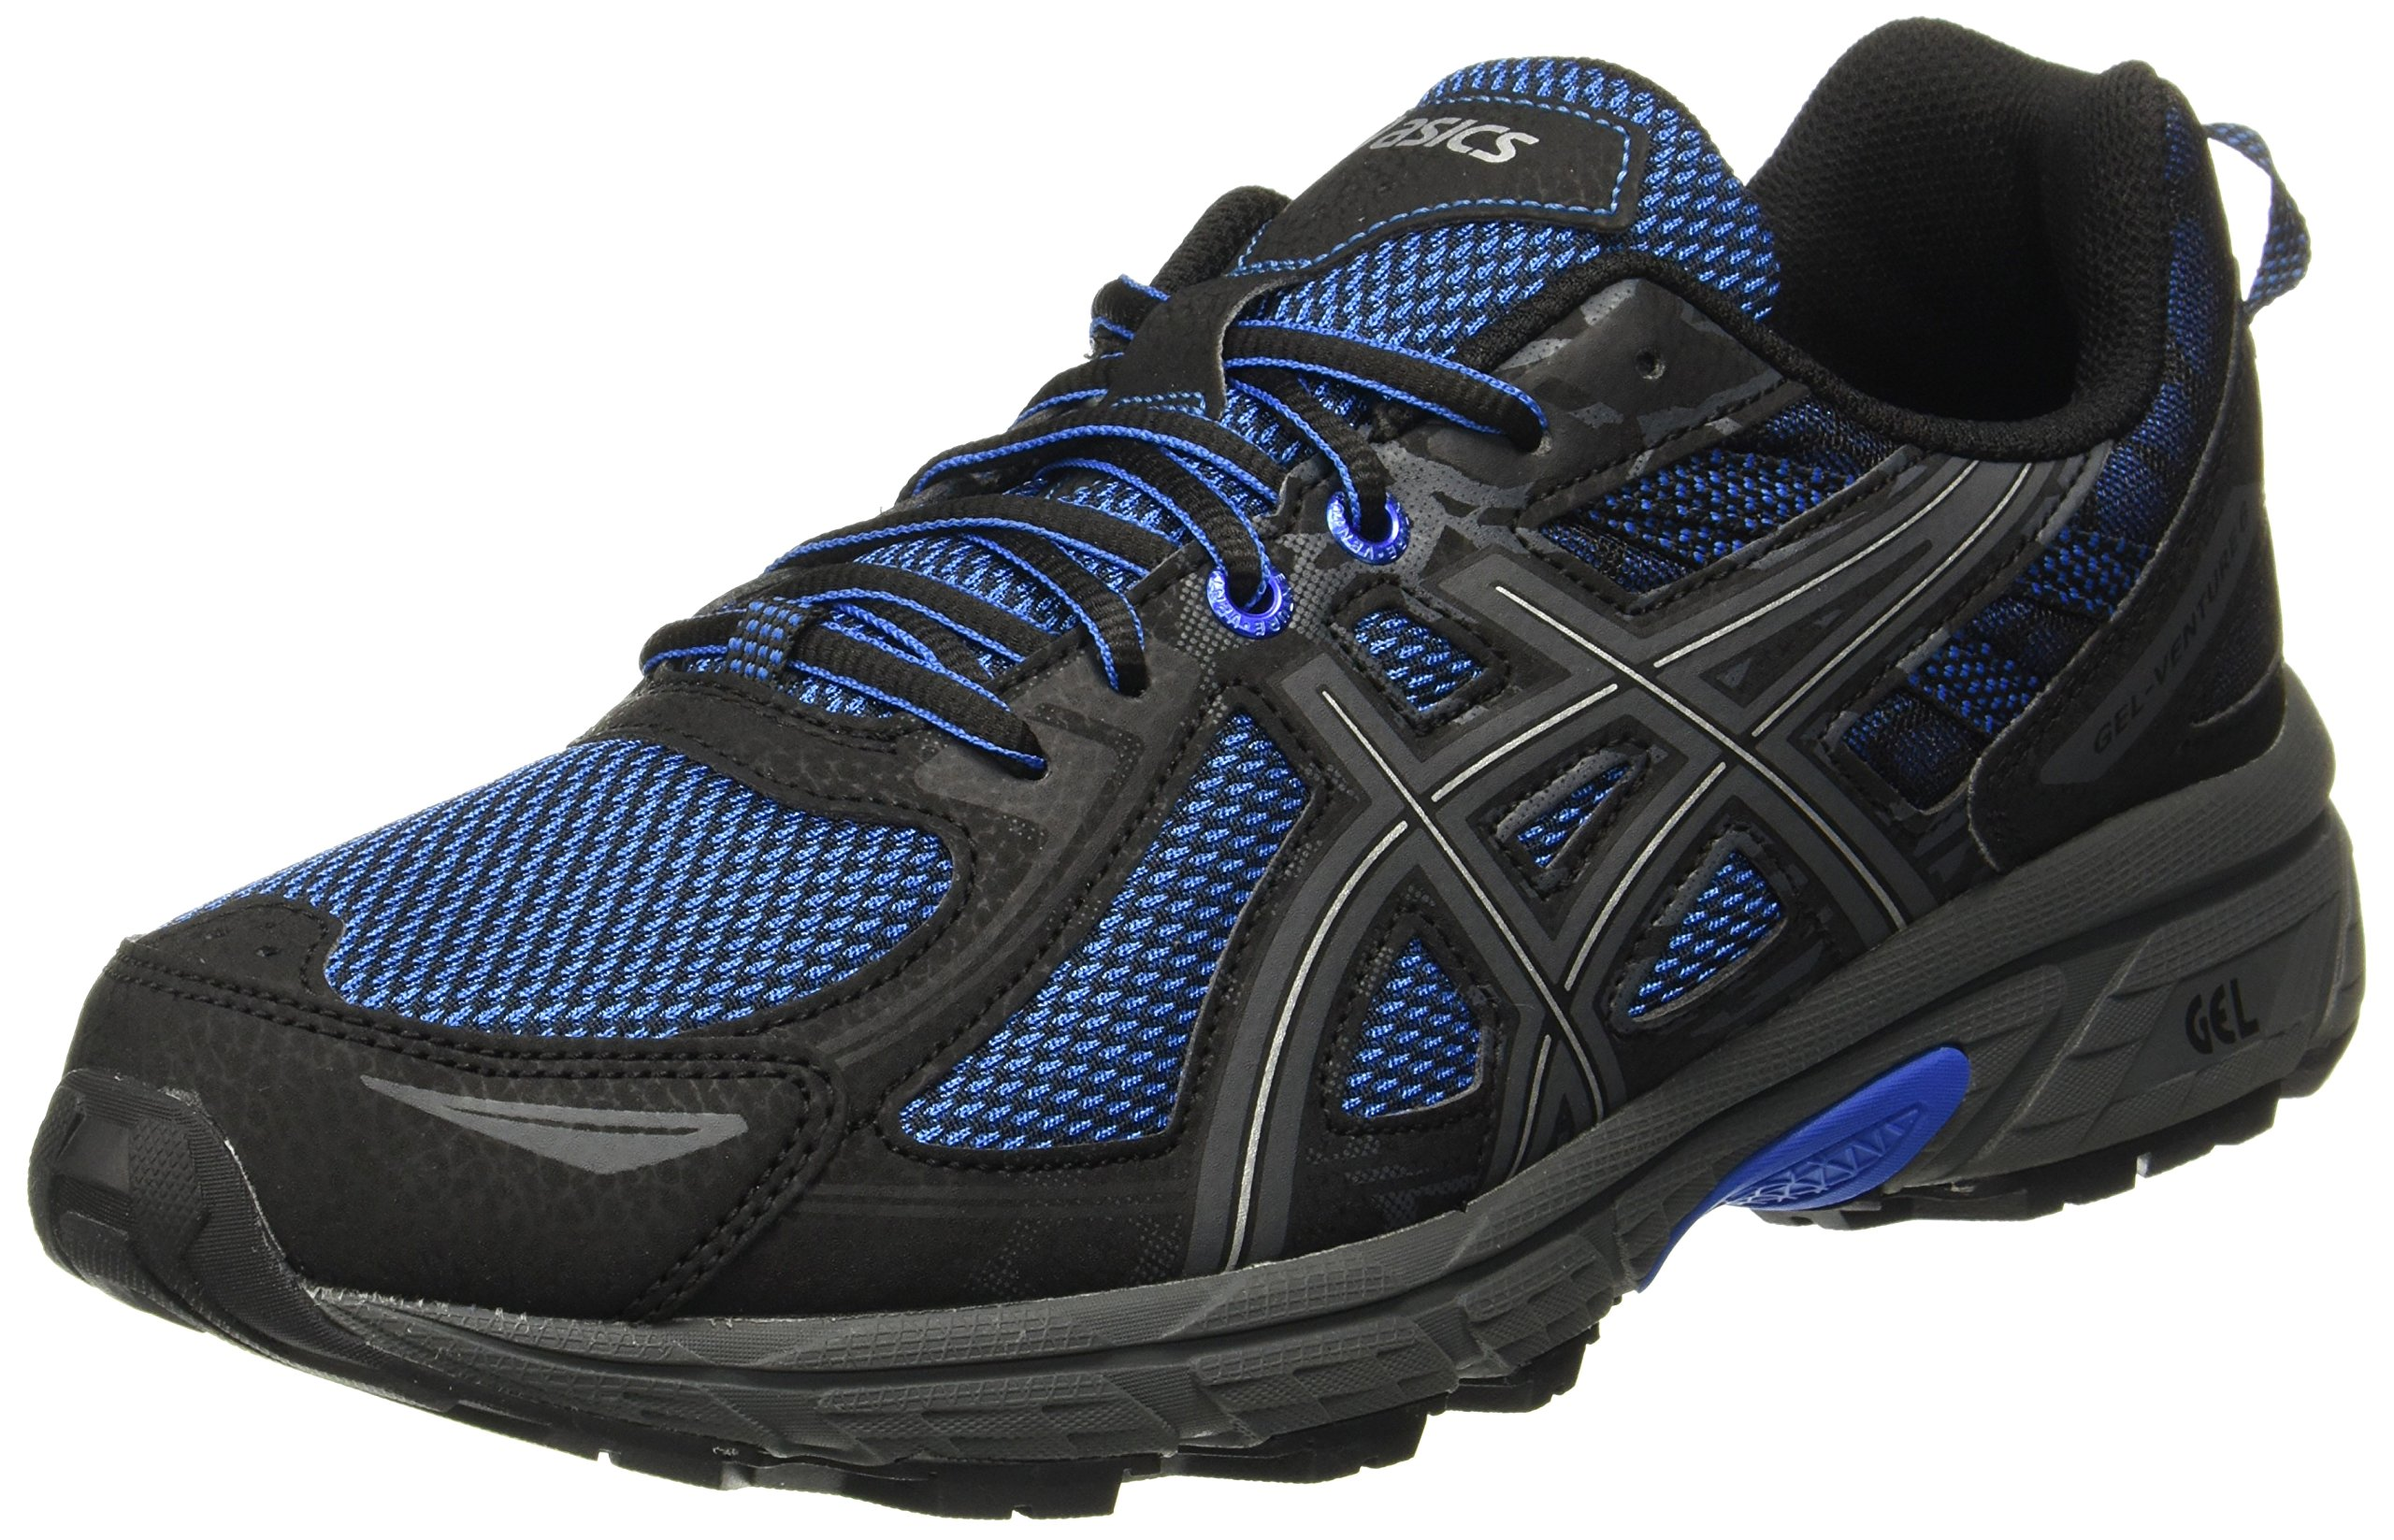 ASICS Gel-Venture 6 Mens Running Trainers T7G1N Sneakers Shoes (UK 9 US 10 EU 44, Victoria Blue Black 4545)